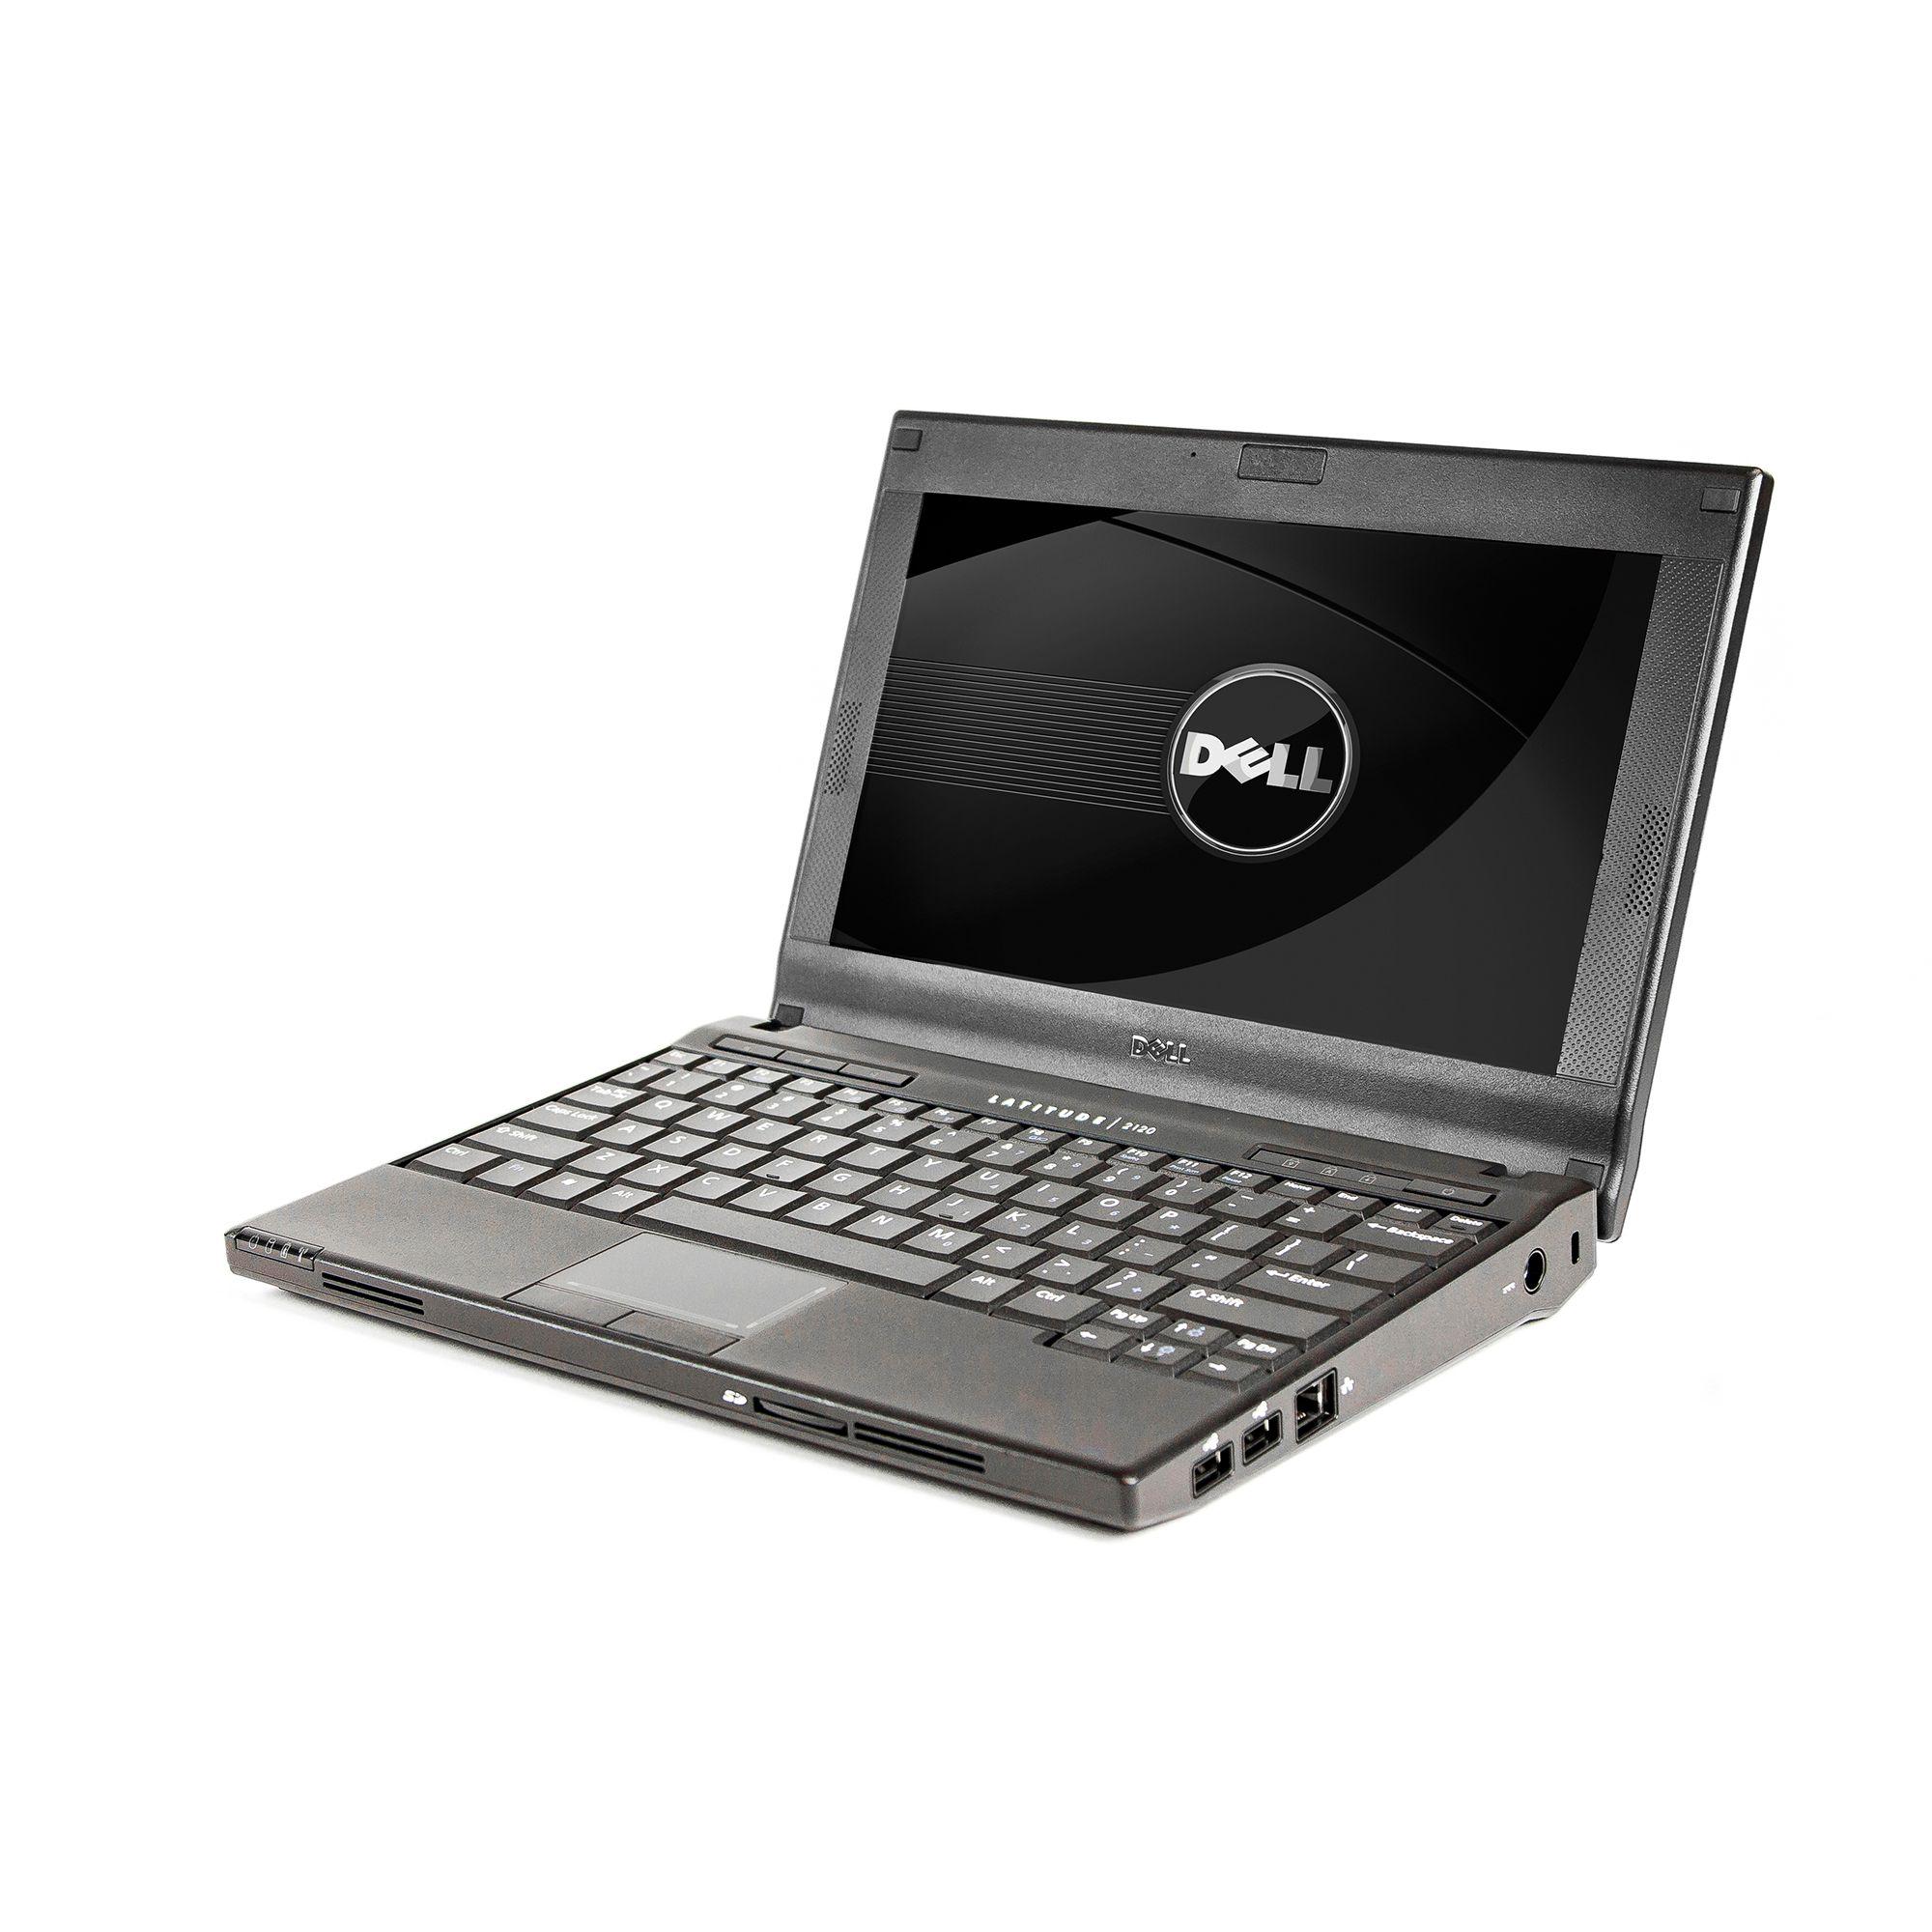 Dell 101 latitude 2120 mini 2gb ram 250gb hdd windows